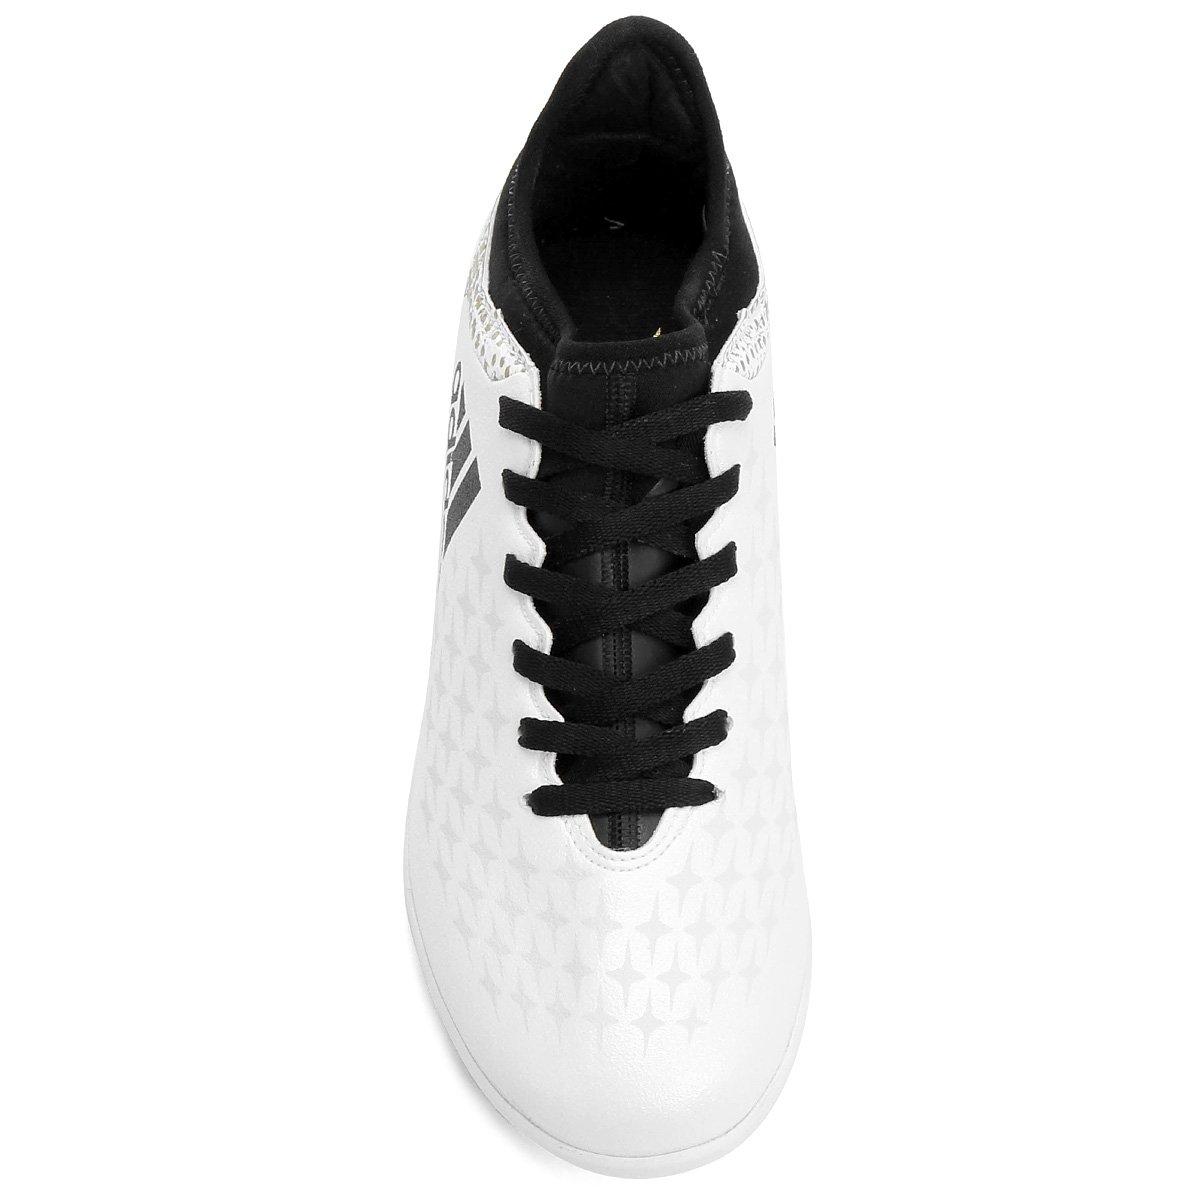 Chuteira Adidas X 16.3 IN Futsal Infantil - Compre Agora  bc8f4ffe63e6d